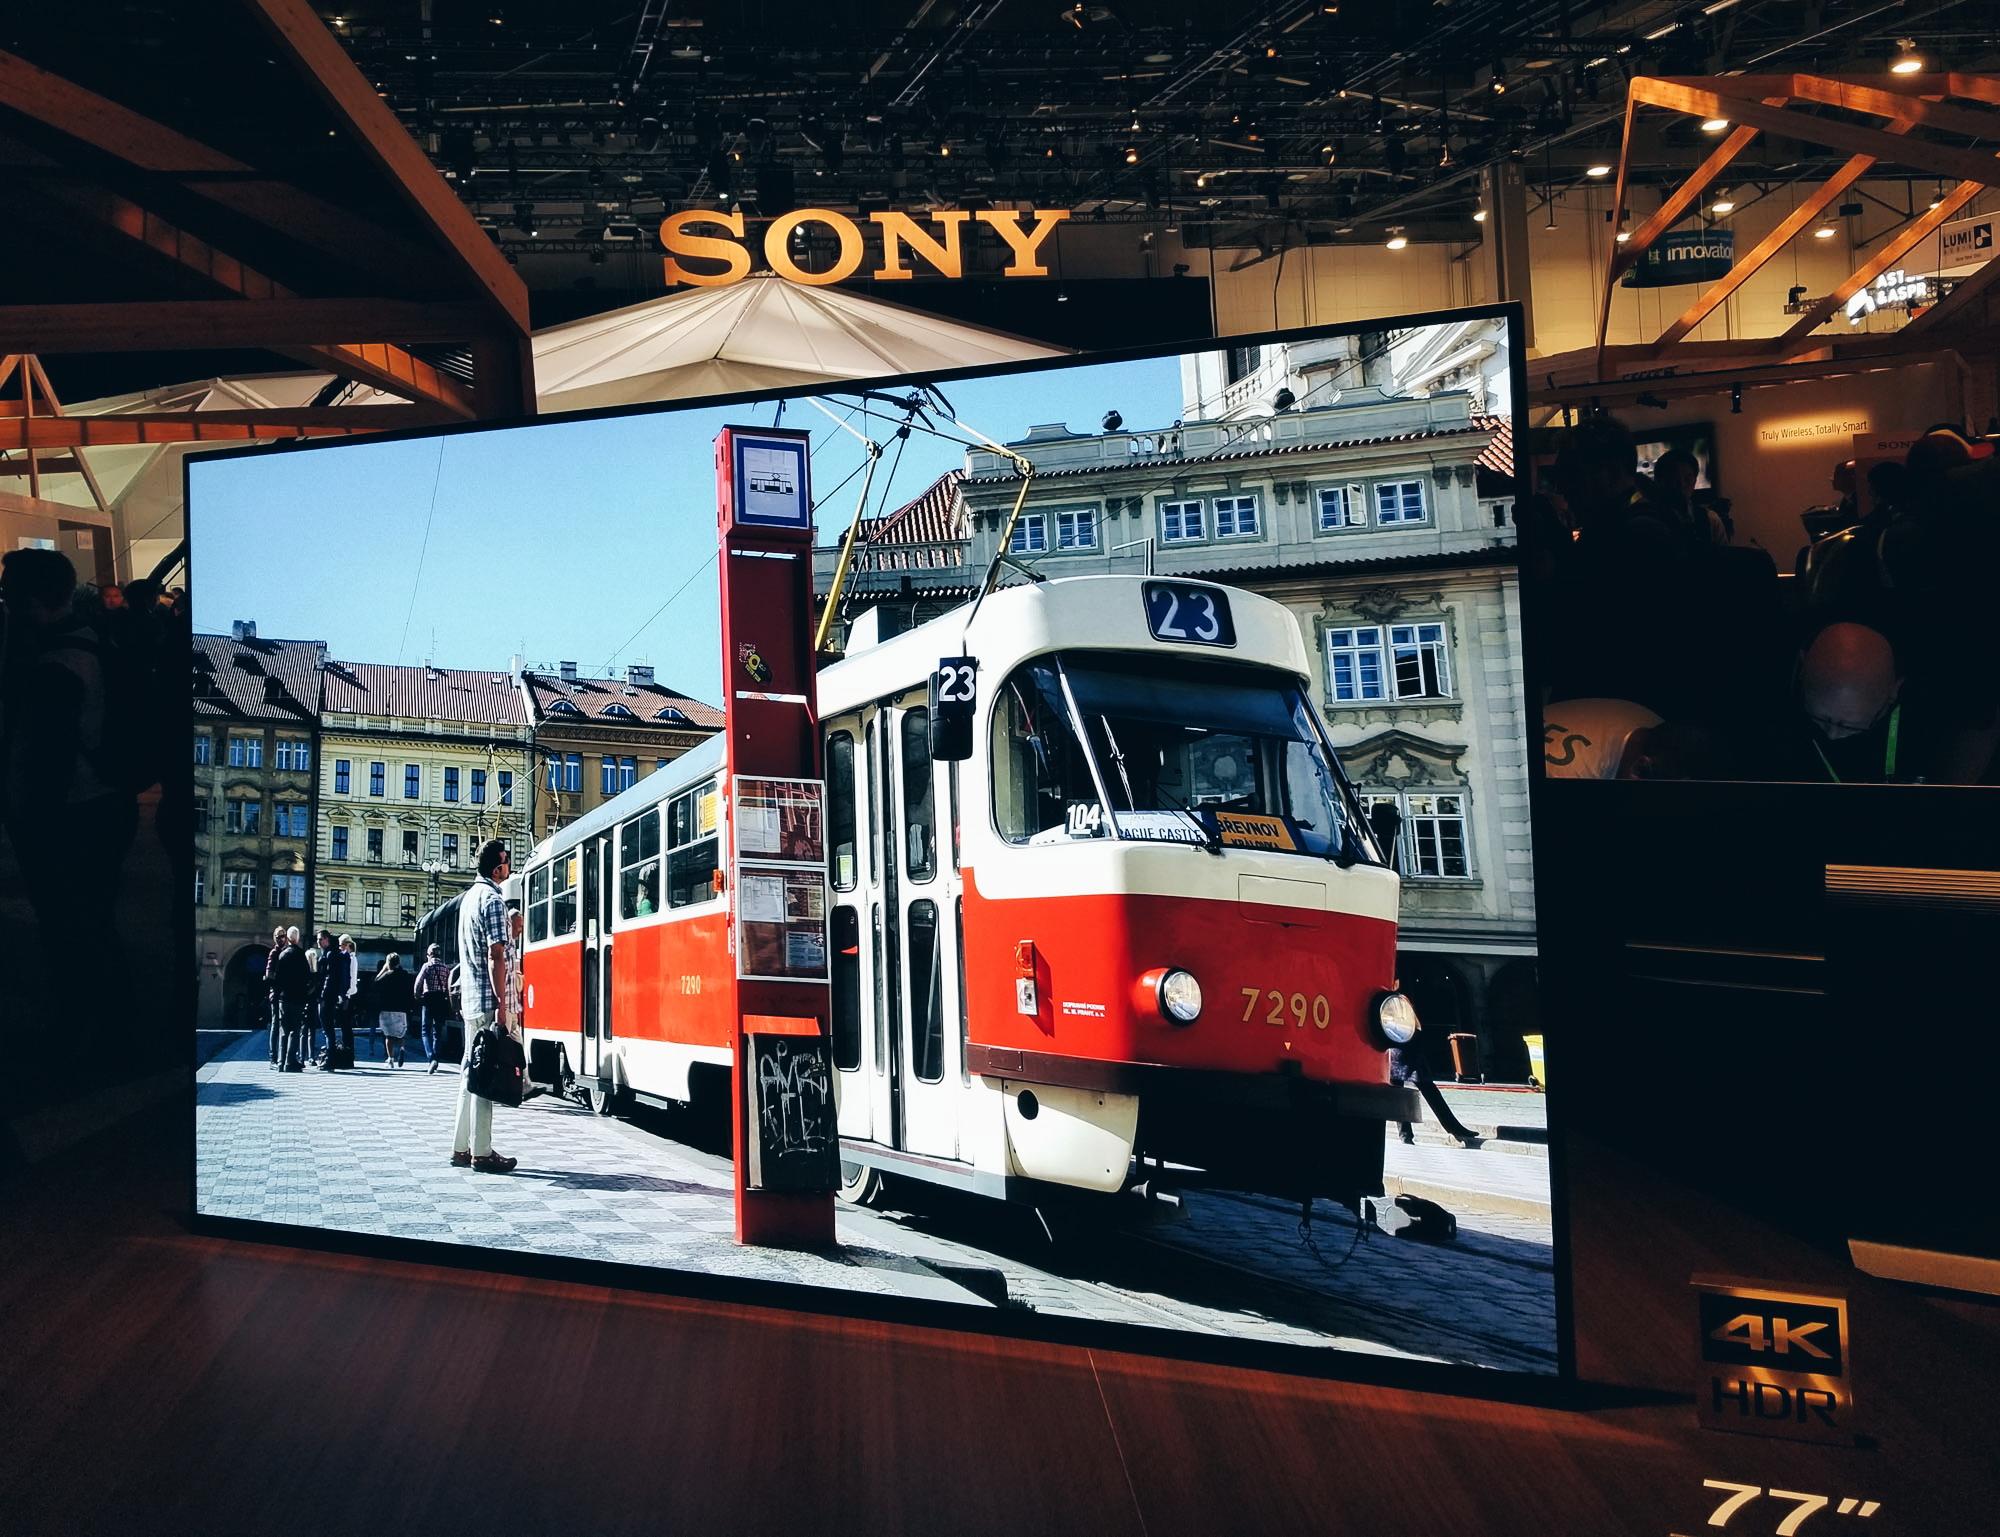 Sony 4K TV CES 2018